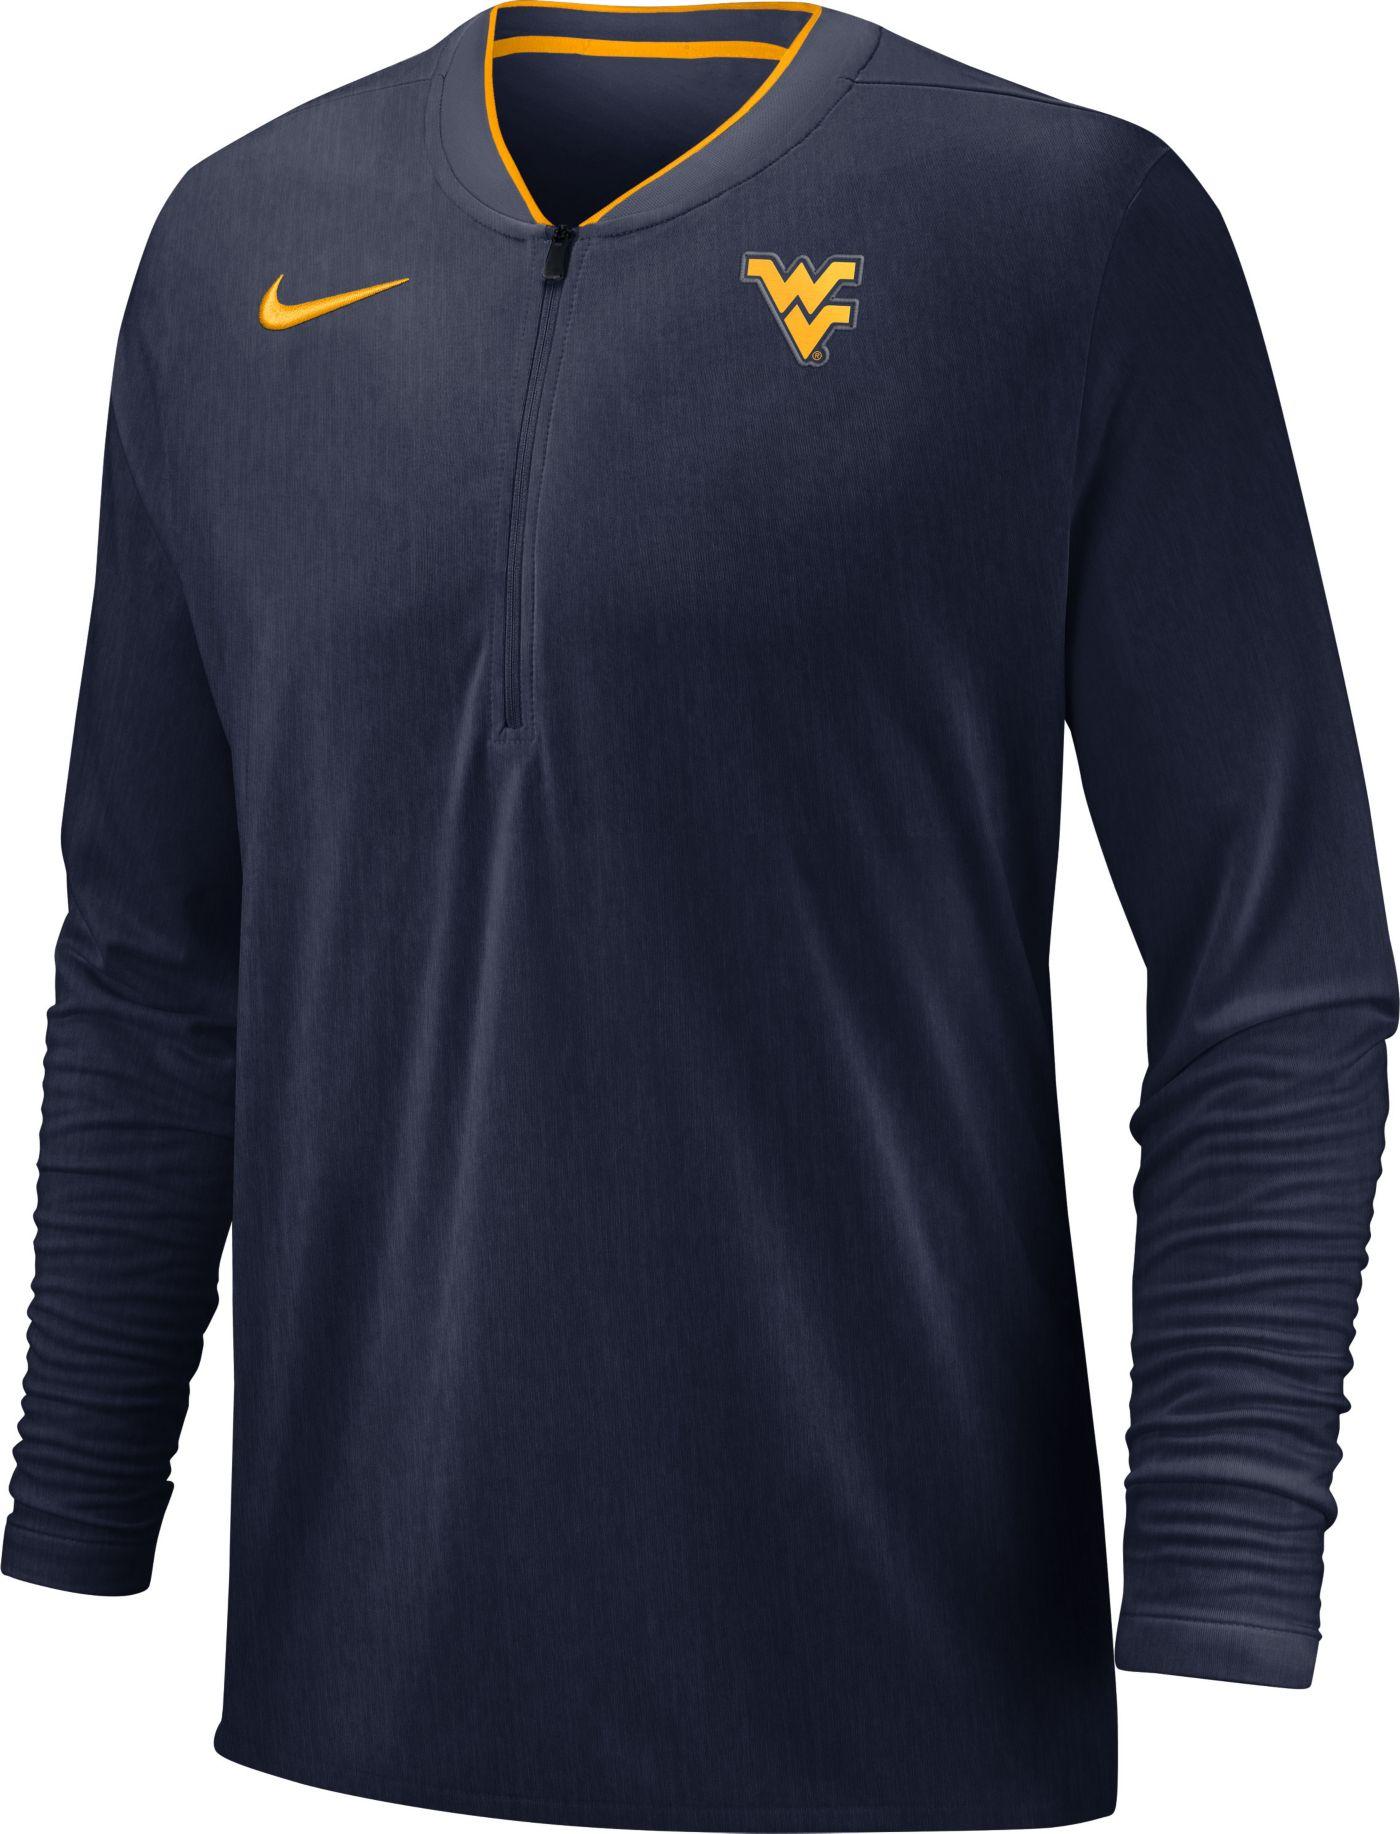 Nike Men's West Virginia Mountaineers Blue Coach Half-Zip Football Sideline Jacket